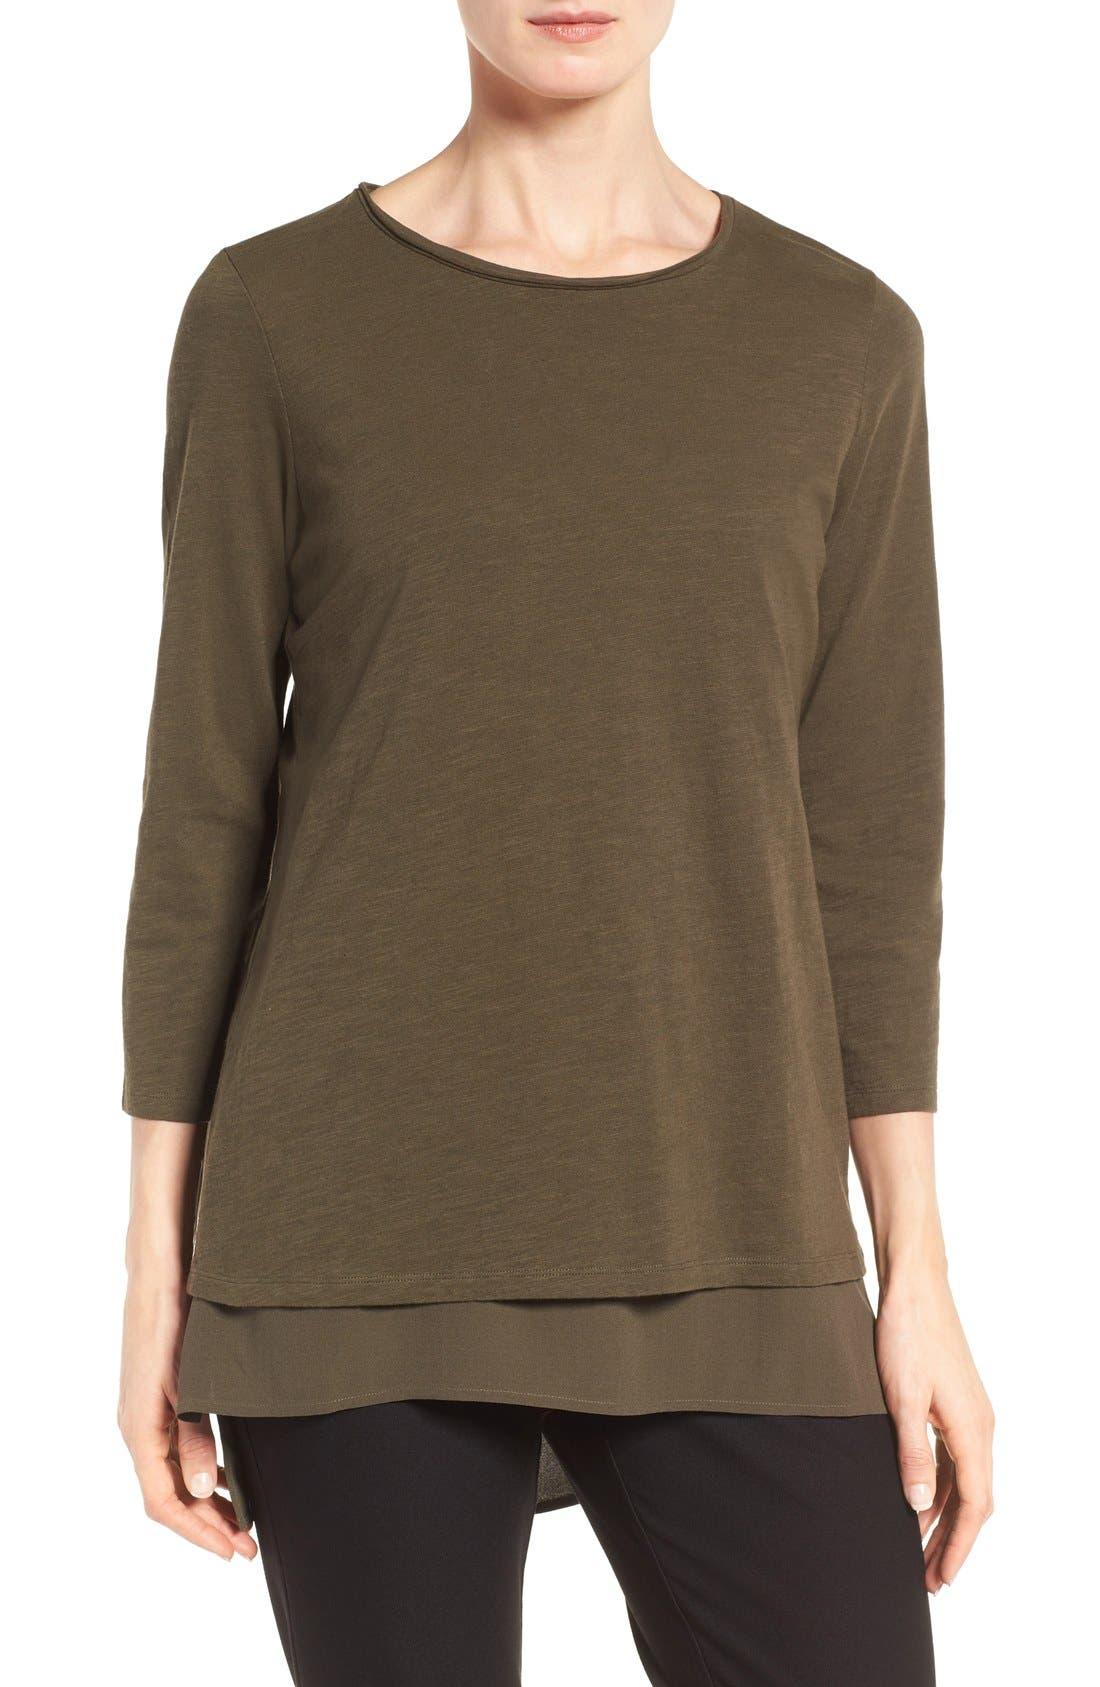 Alternate Image 1 Selected - Eileen Fisher Slubby Organic Cotton Jersey Top